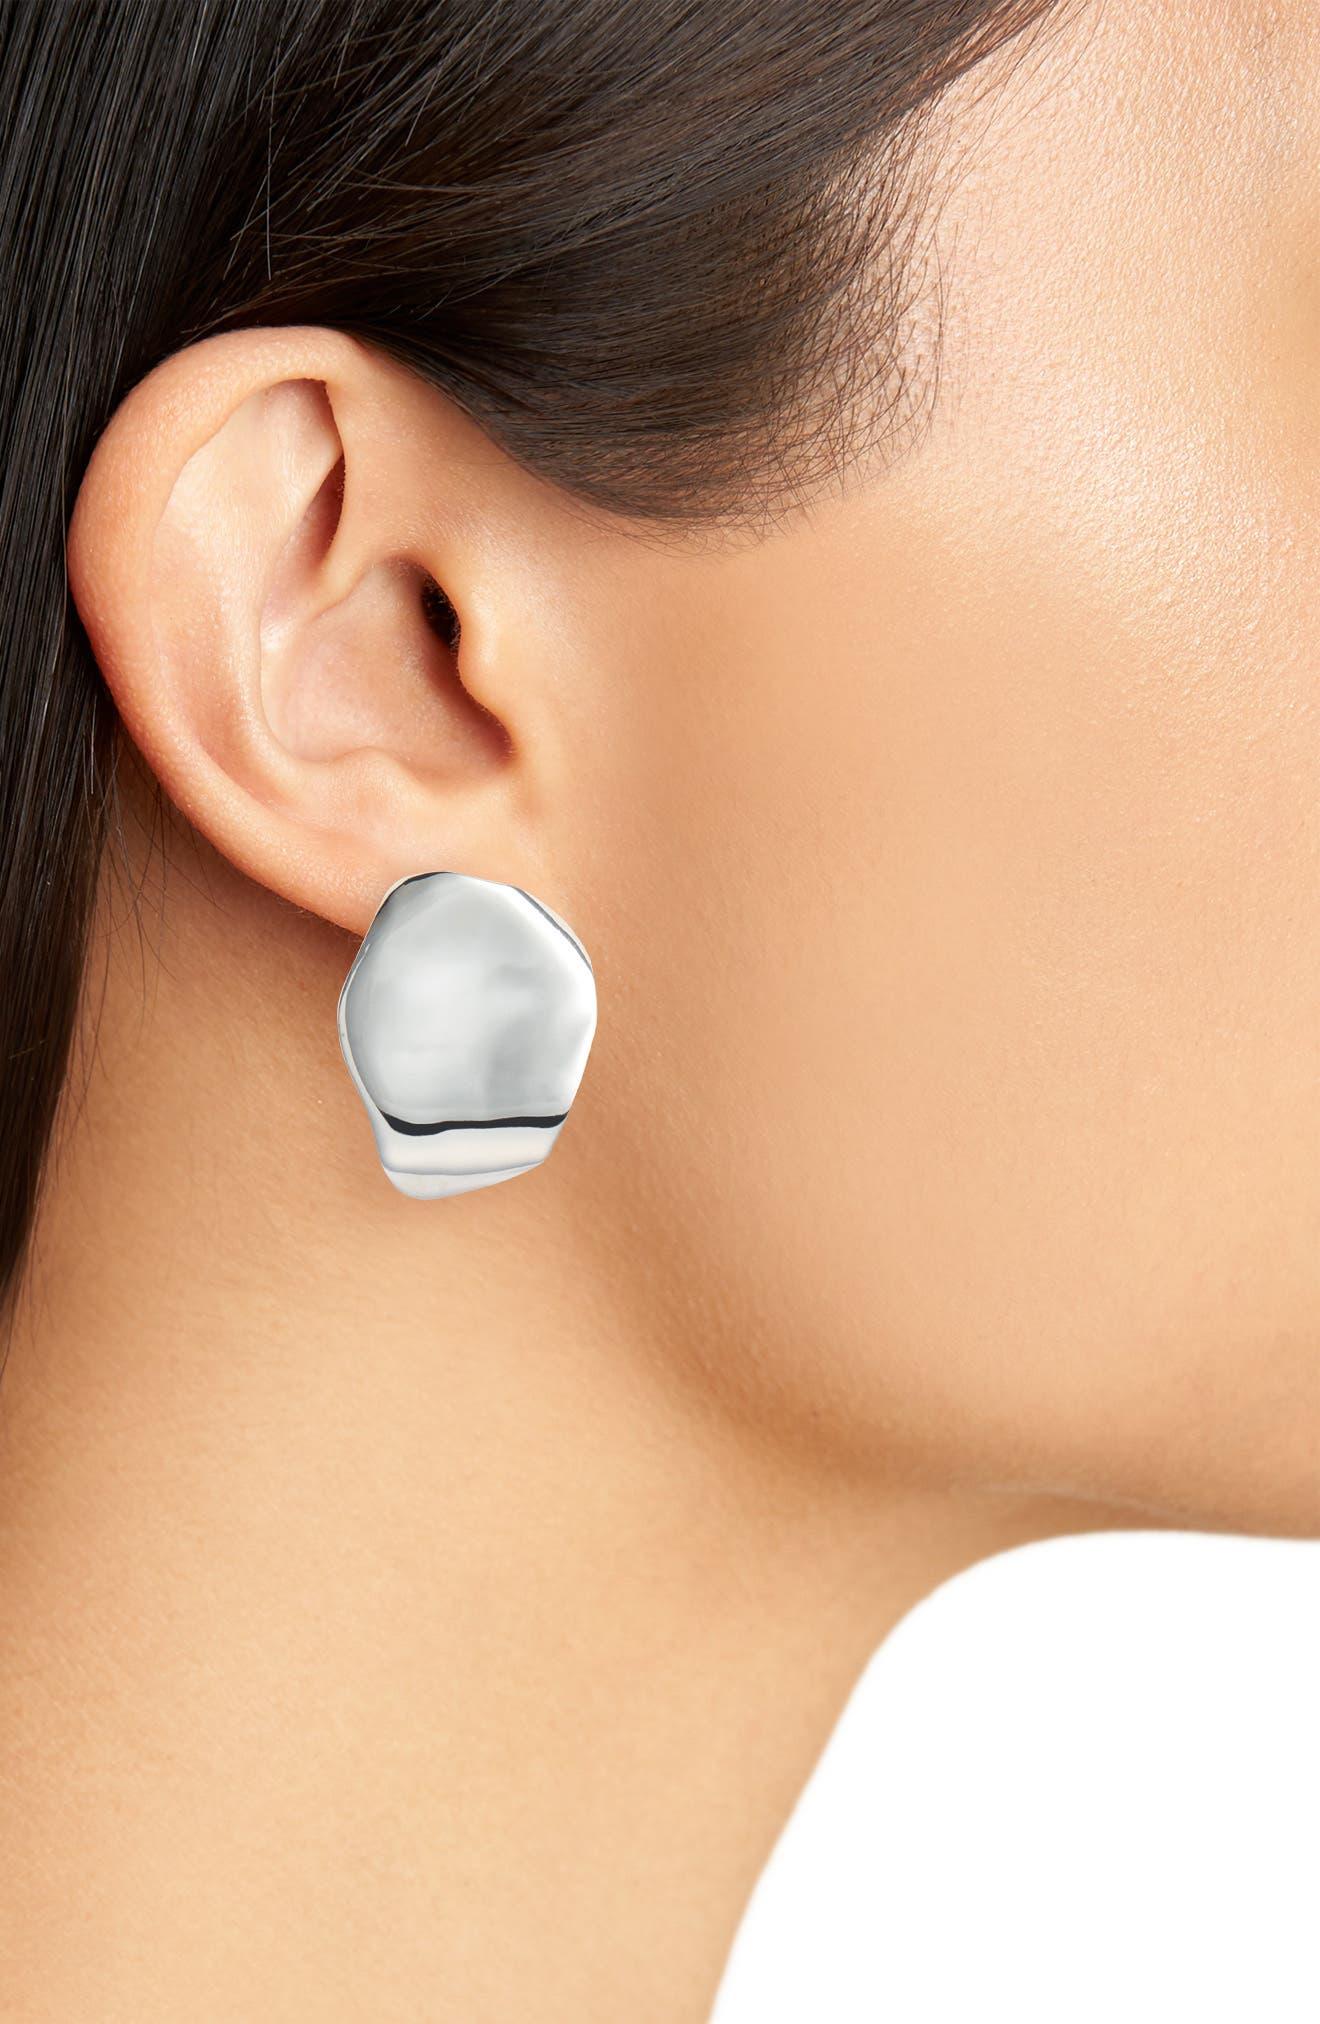 Lecca Stud Earrings,                             Alternate thumbnail 3, color,                             STERLING SILVER